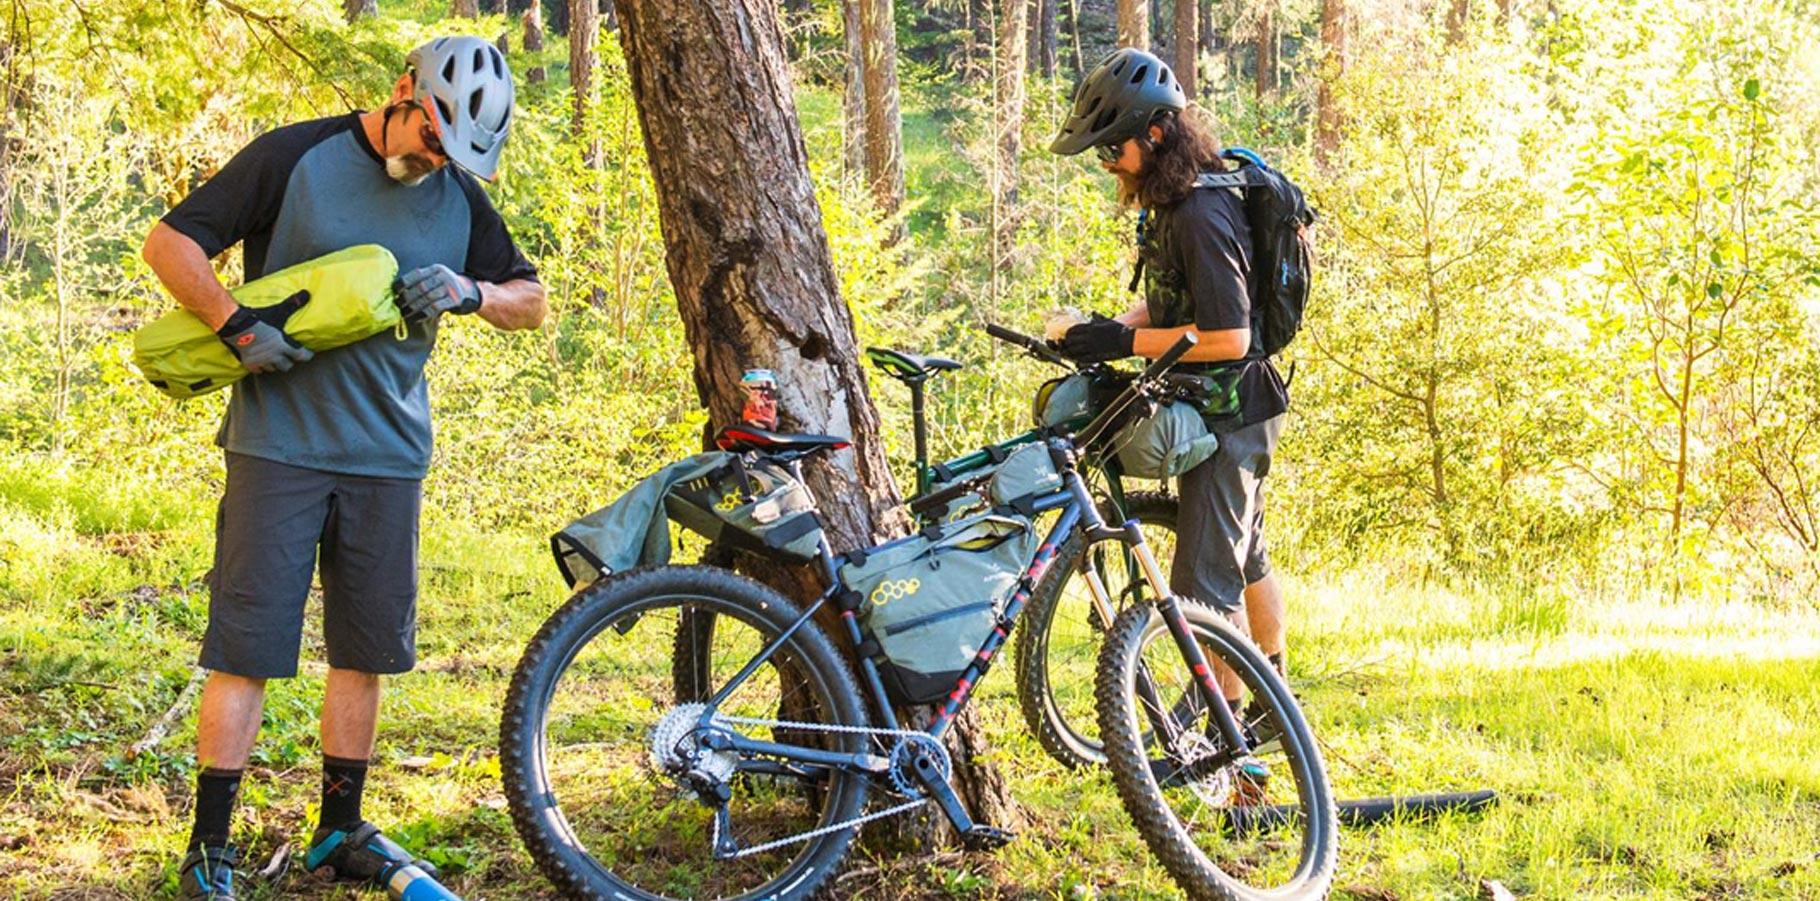 Apidura-bikepacking-expedicni-brasny